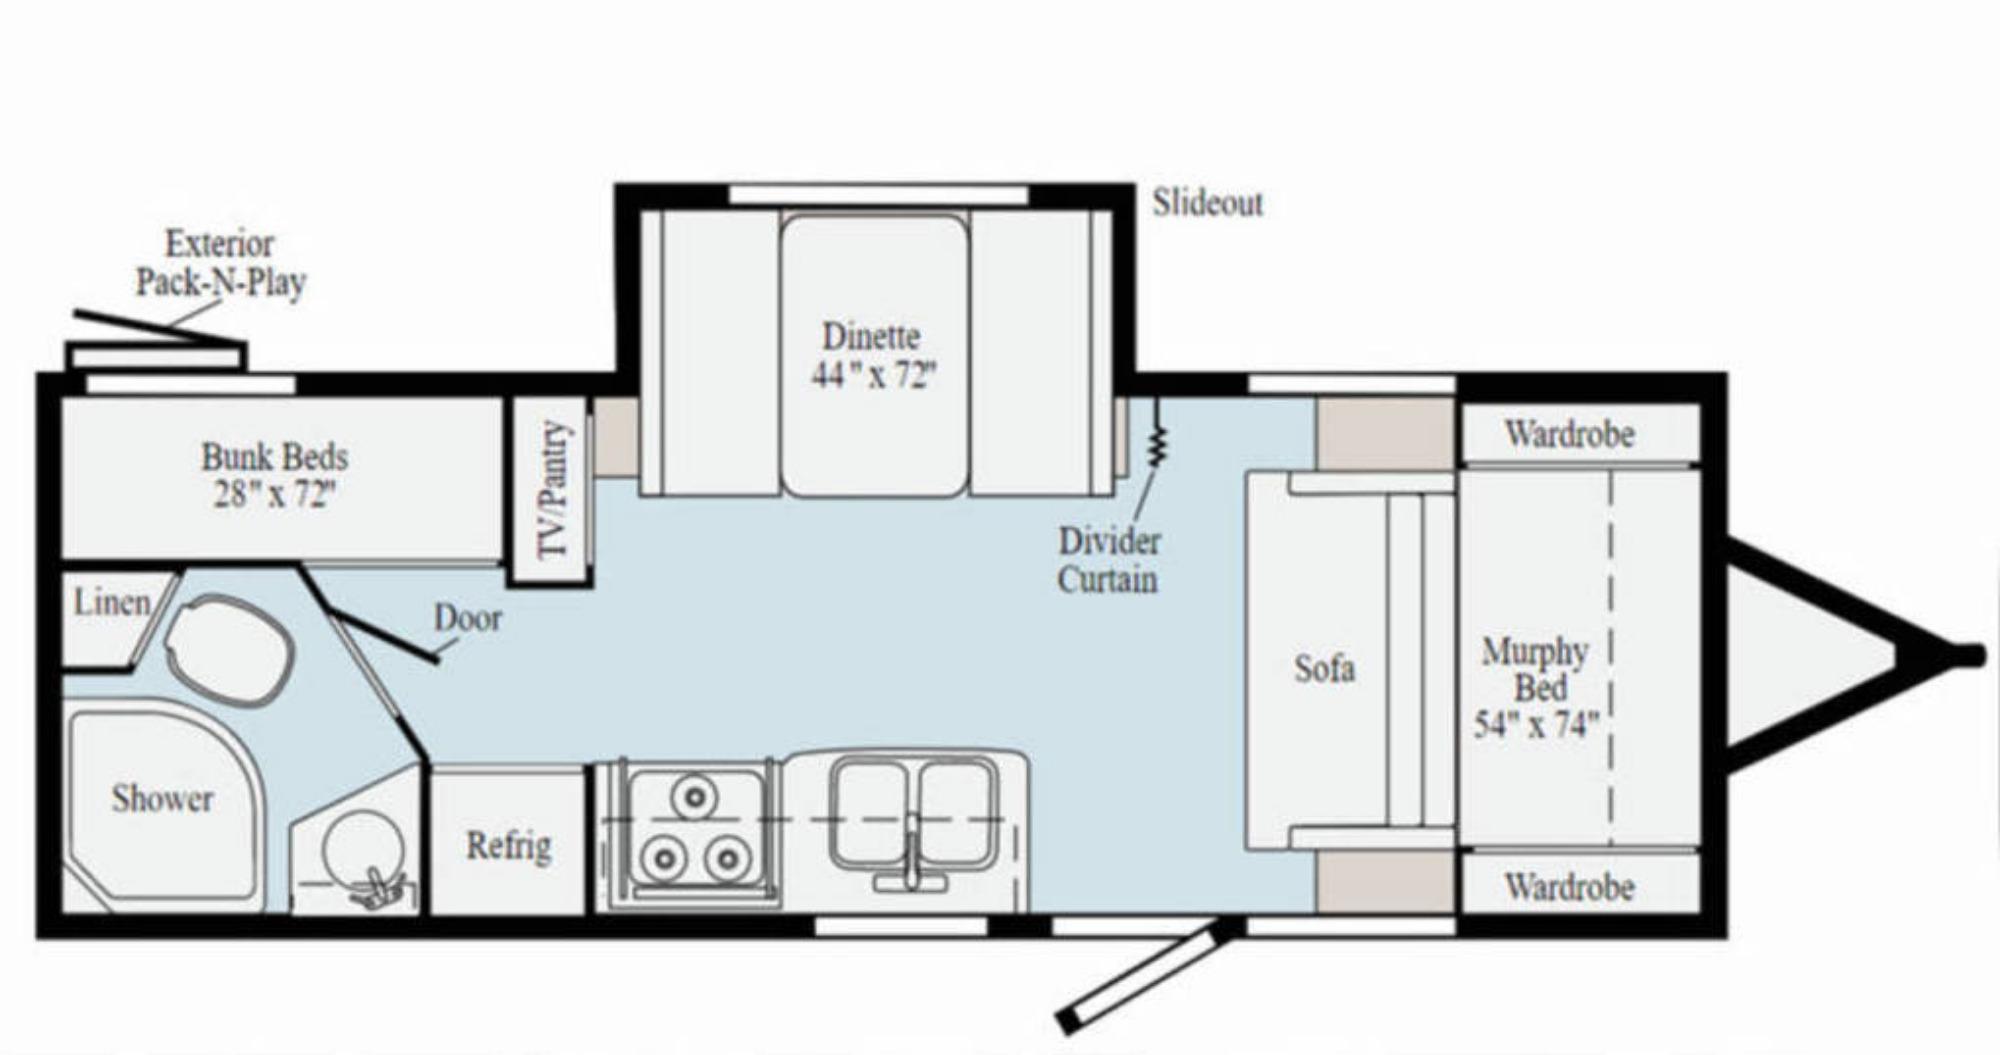 View Floor Plan for 2021 WINNEBAGO MICRO MINNIE 2306BHS